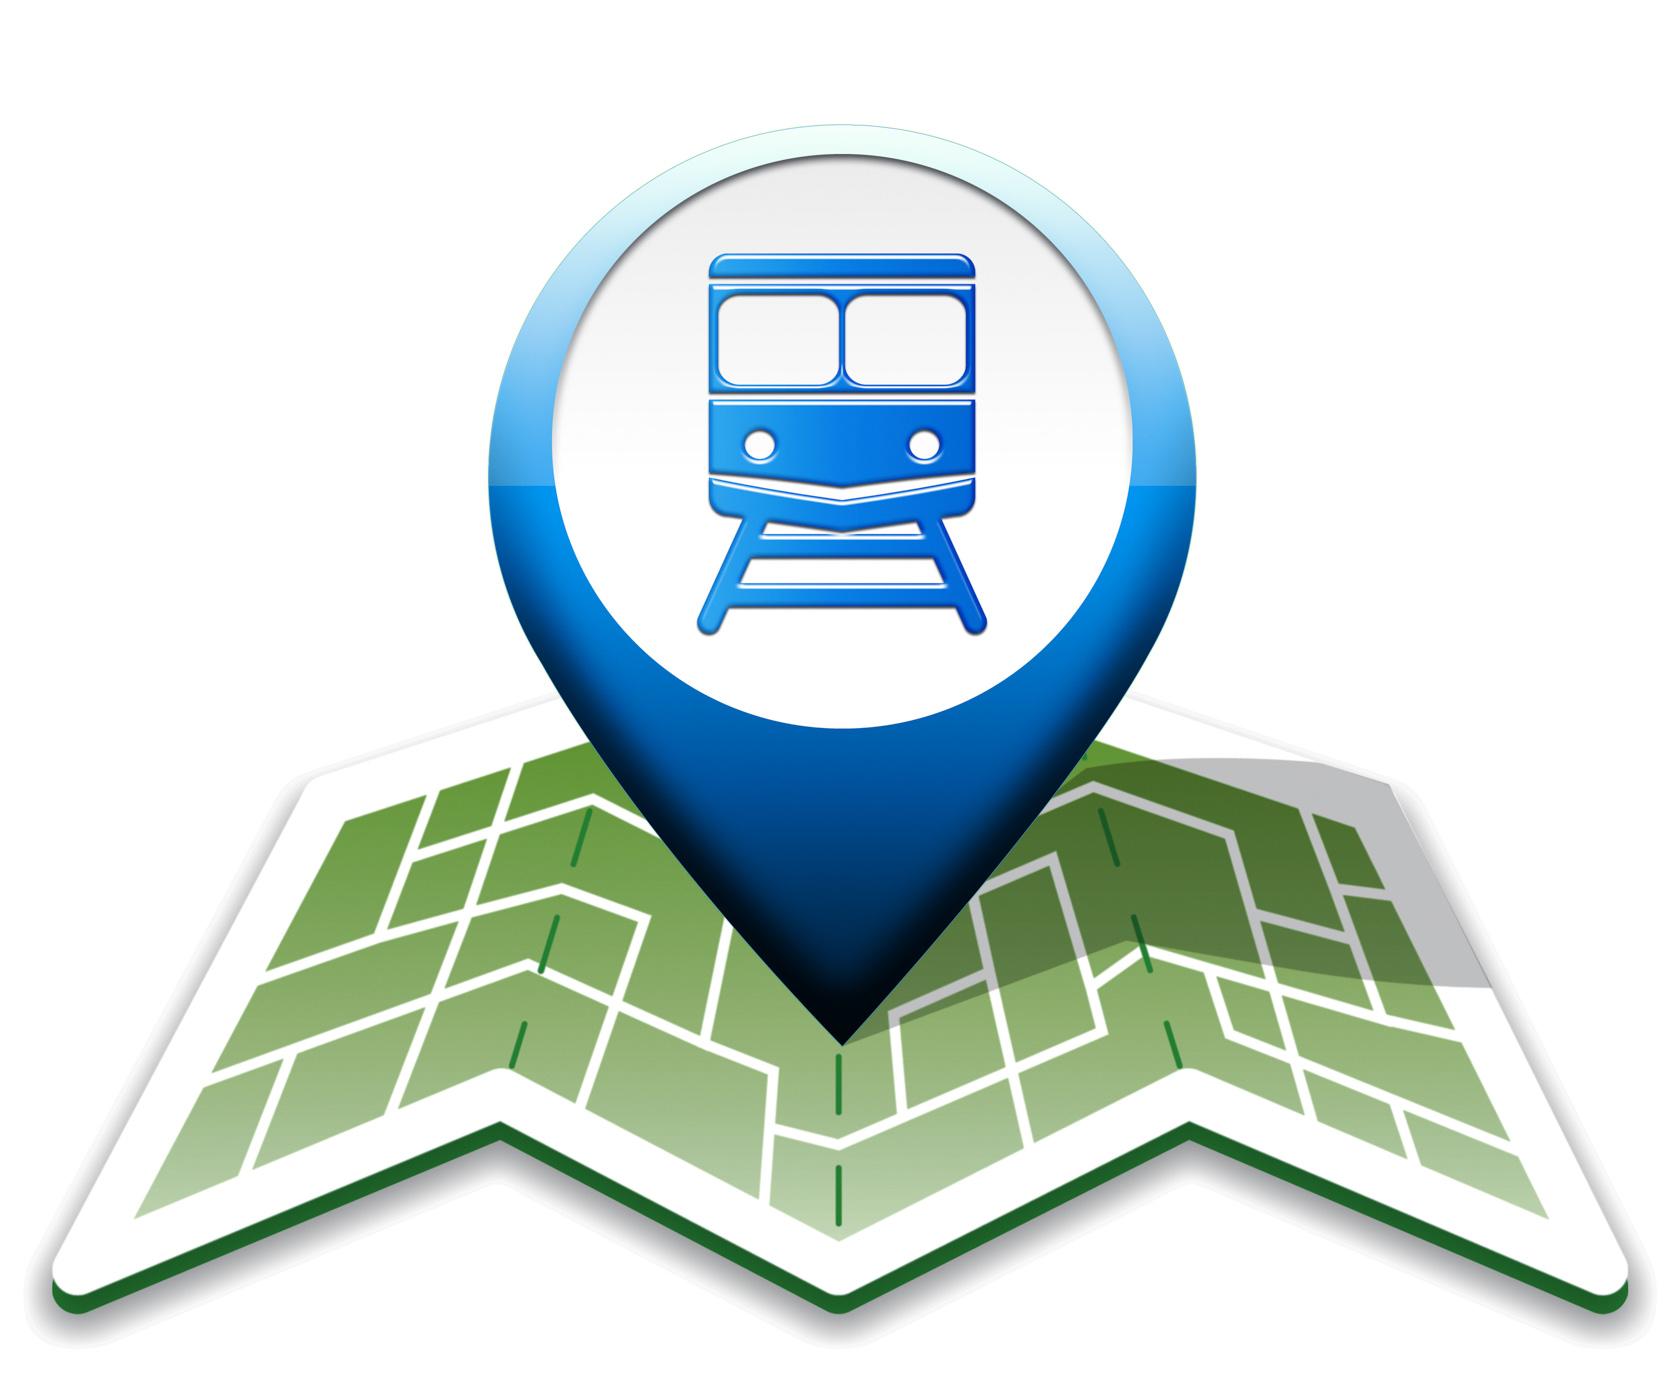 Train Map Indicates Intercity Journey 3d Illustration, 3dIllustration, Railway, Trains, Train, HQ Photo